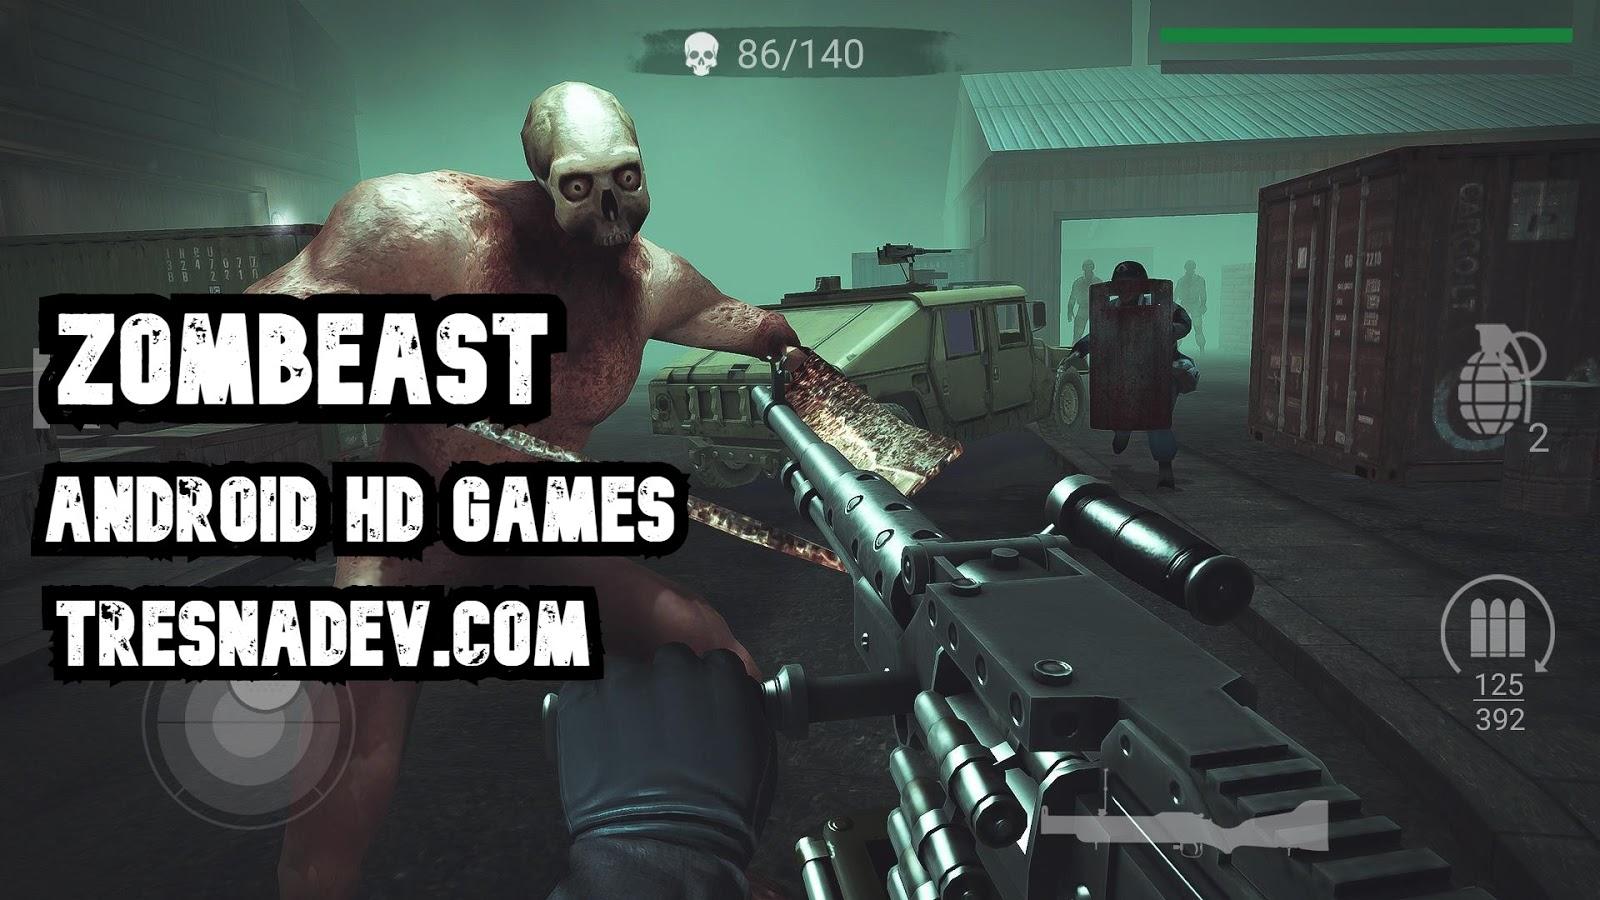 Zombeast Mod Apk Unlimited Money Offline FPS Shooter